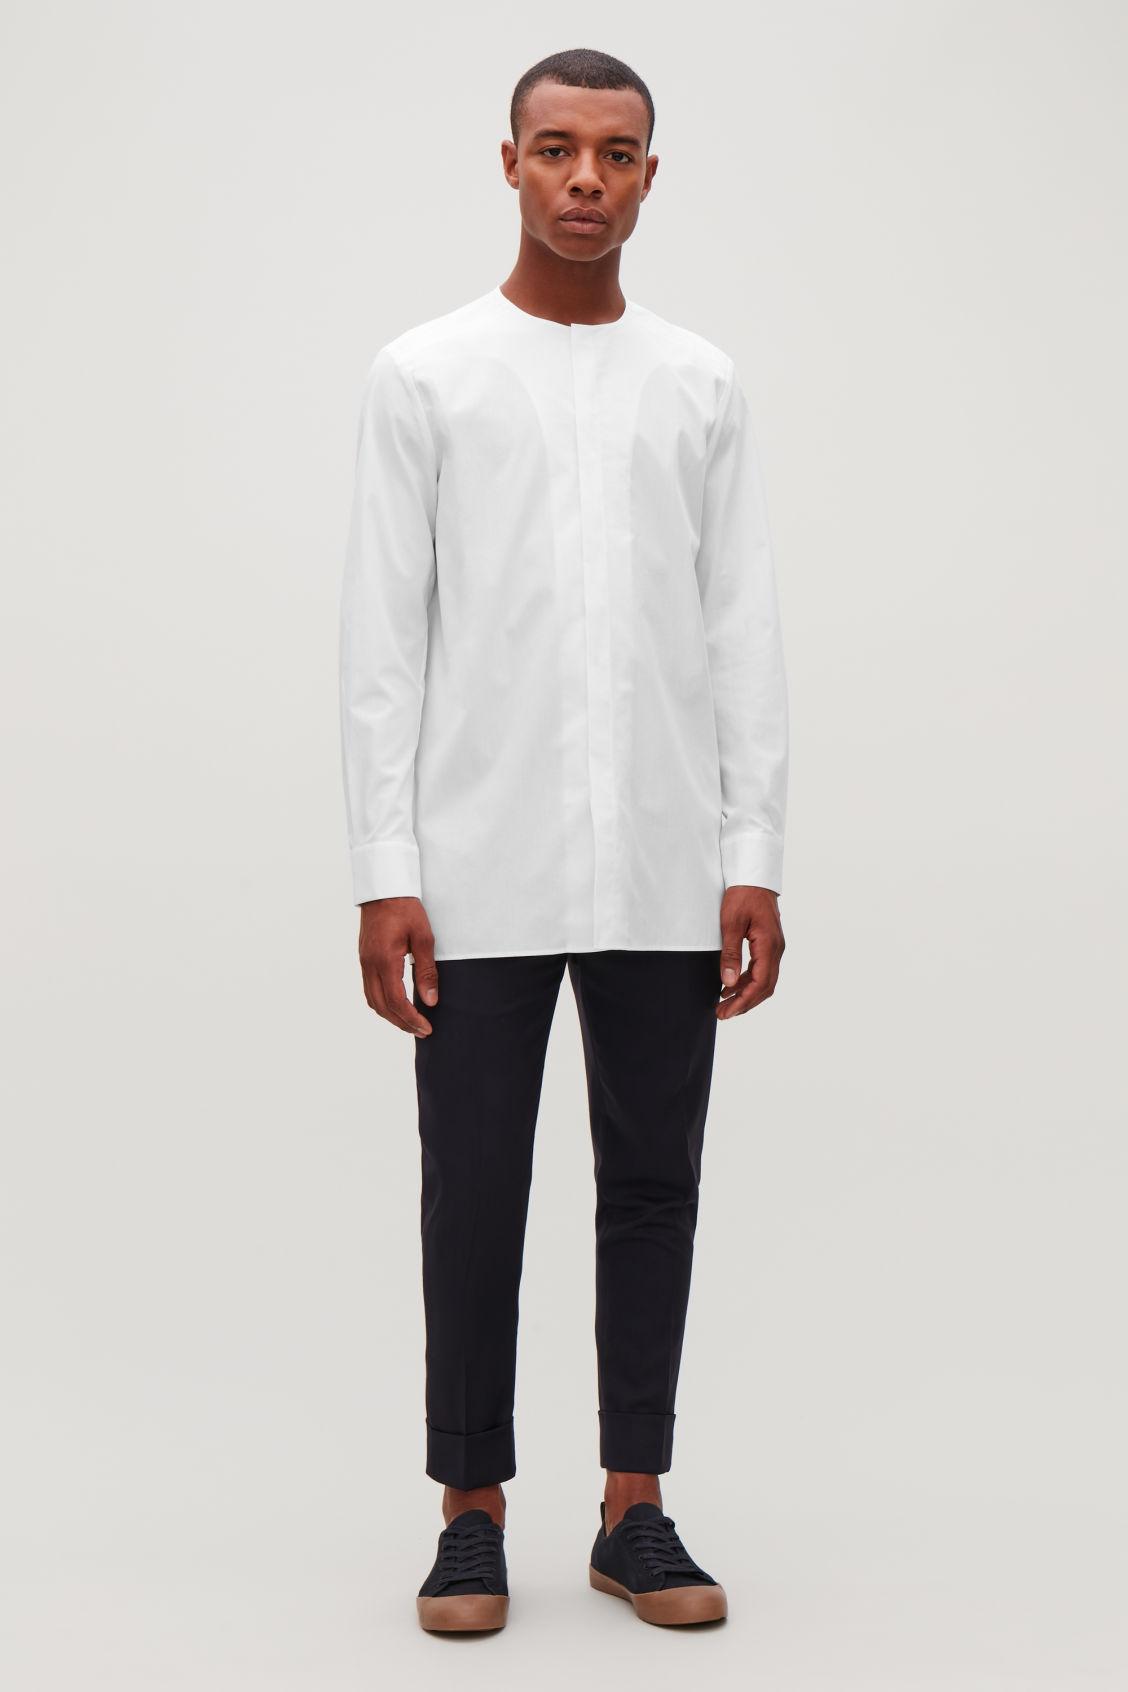 Collarless Long Sleeved Shirt White Shirts Cos